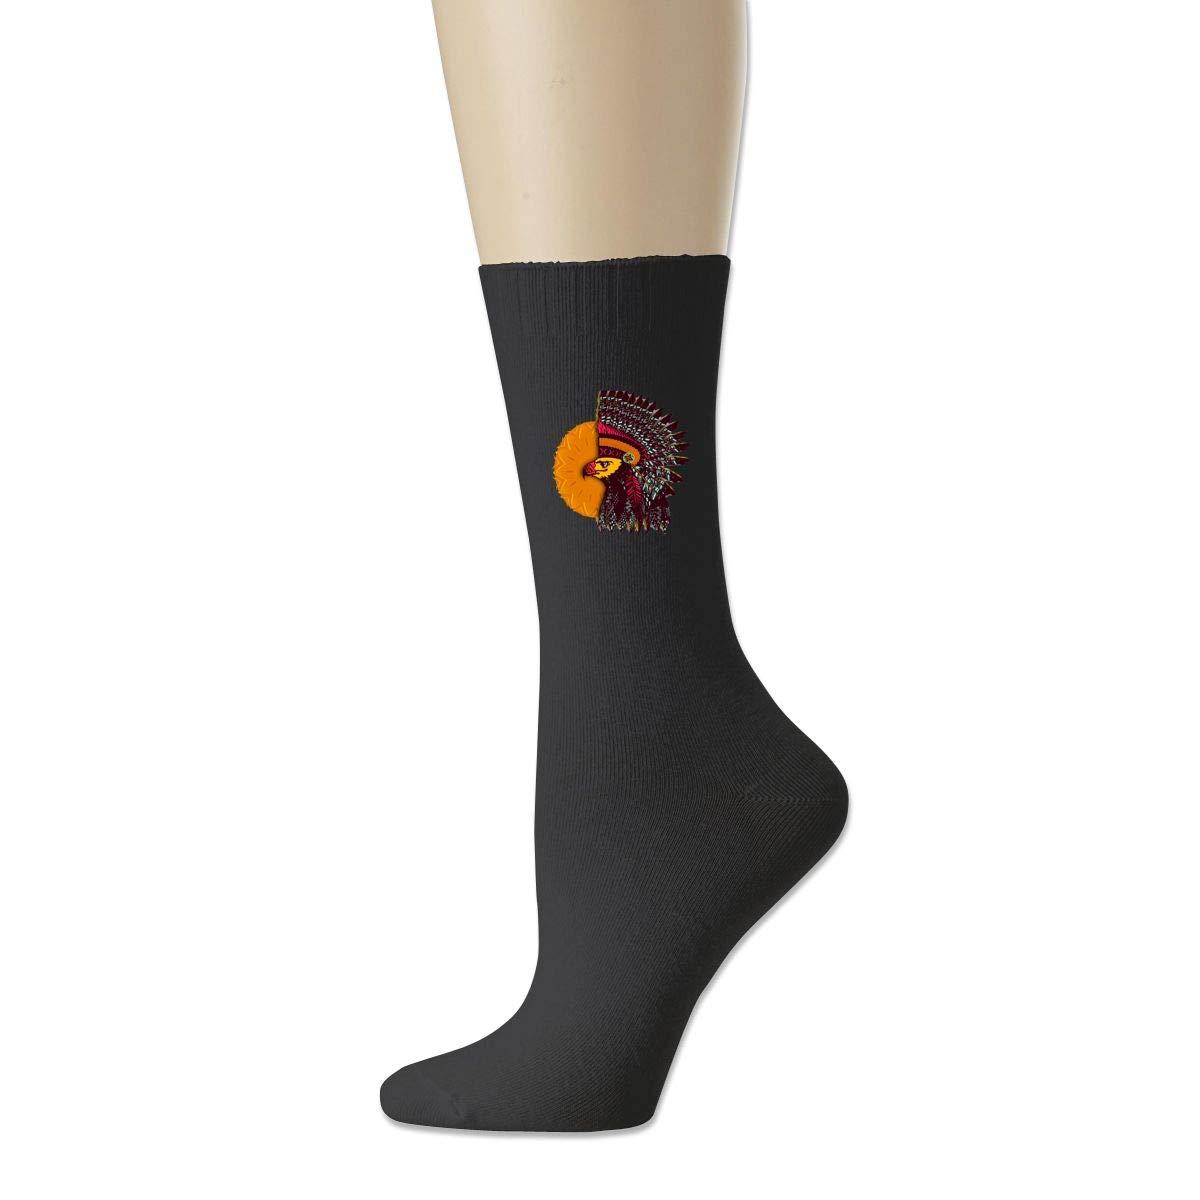 Rigg-socks American Sun Indian Headdress Mens Comfortable Sport Socks Gray